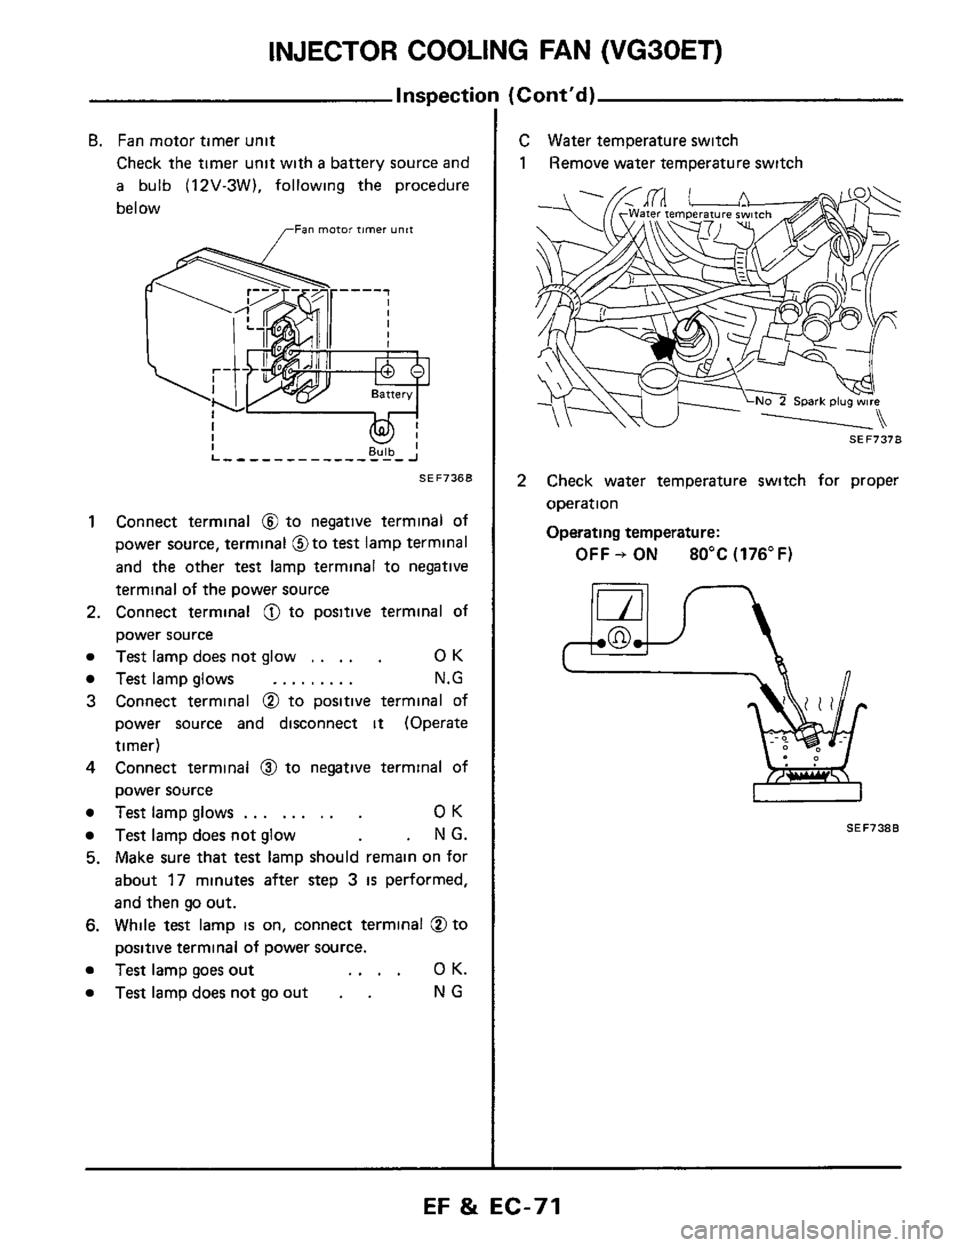 medium resolution of nissan 300zx 1984 z31 engine fuel and emission control system workshop manual